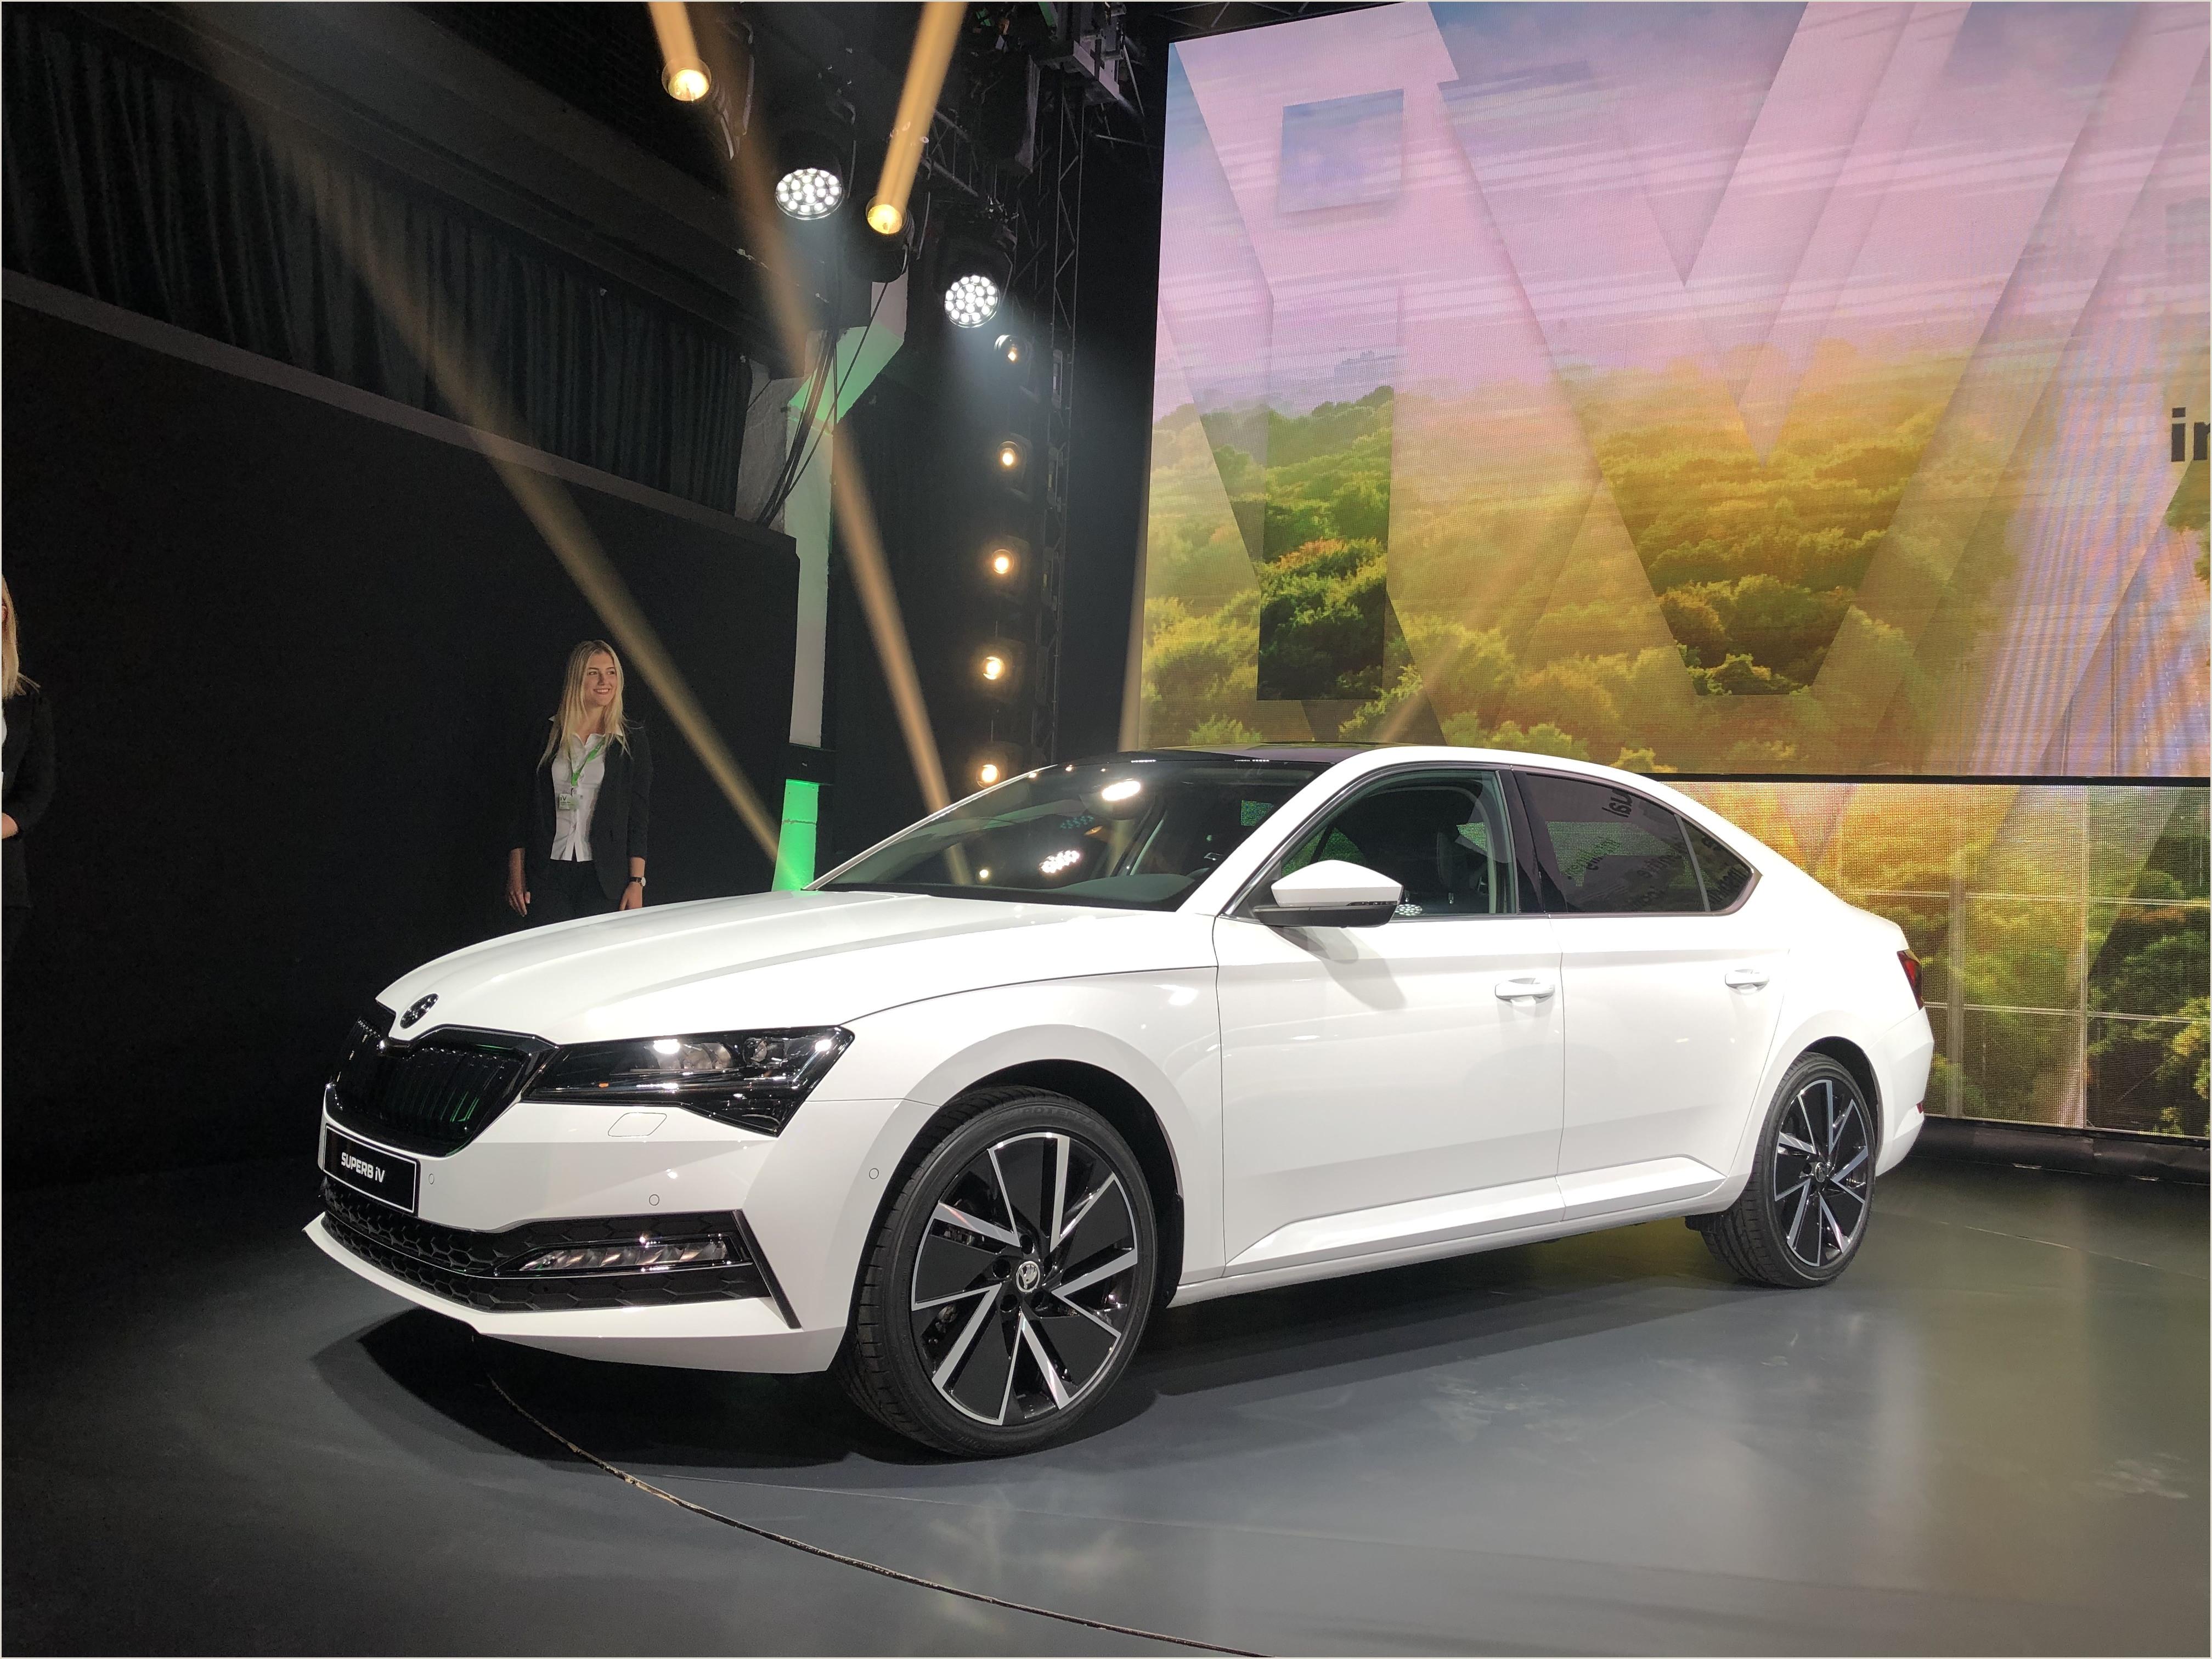 Car Show Registration form Template Skoda Superb 2019 Elle Passe  L Hybride Présentation Vidéo